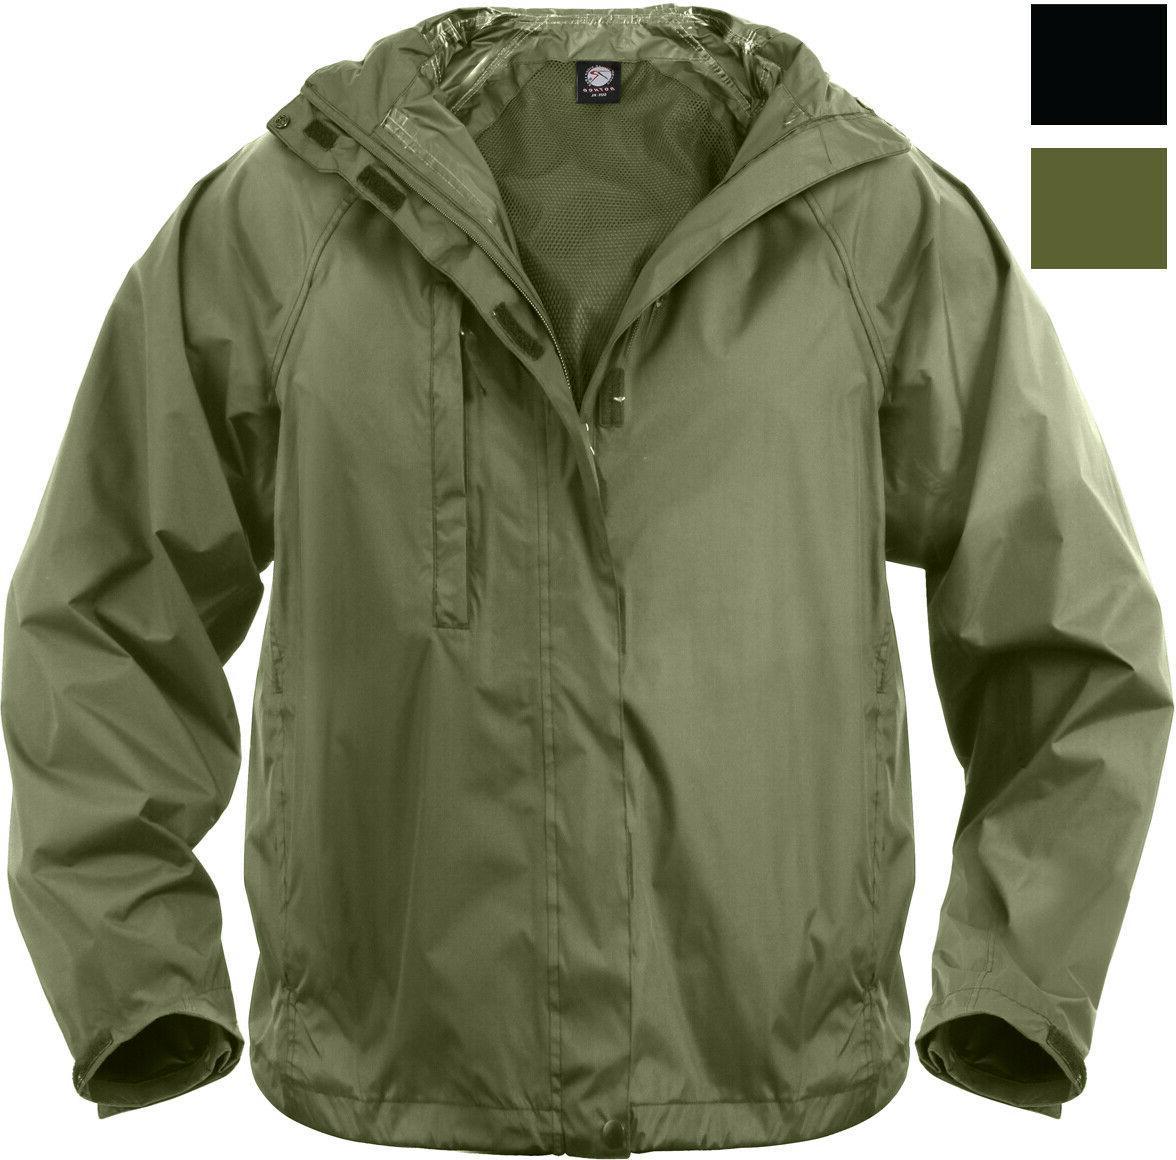 Waterproof Packable Outerwear Rip-Stop Rain Jacket